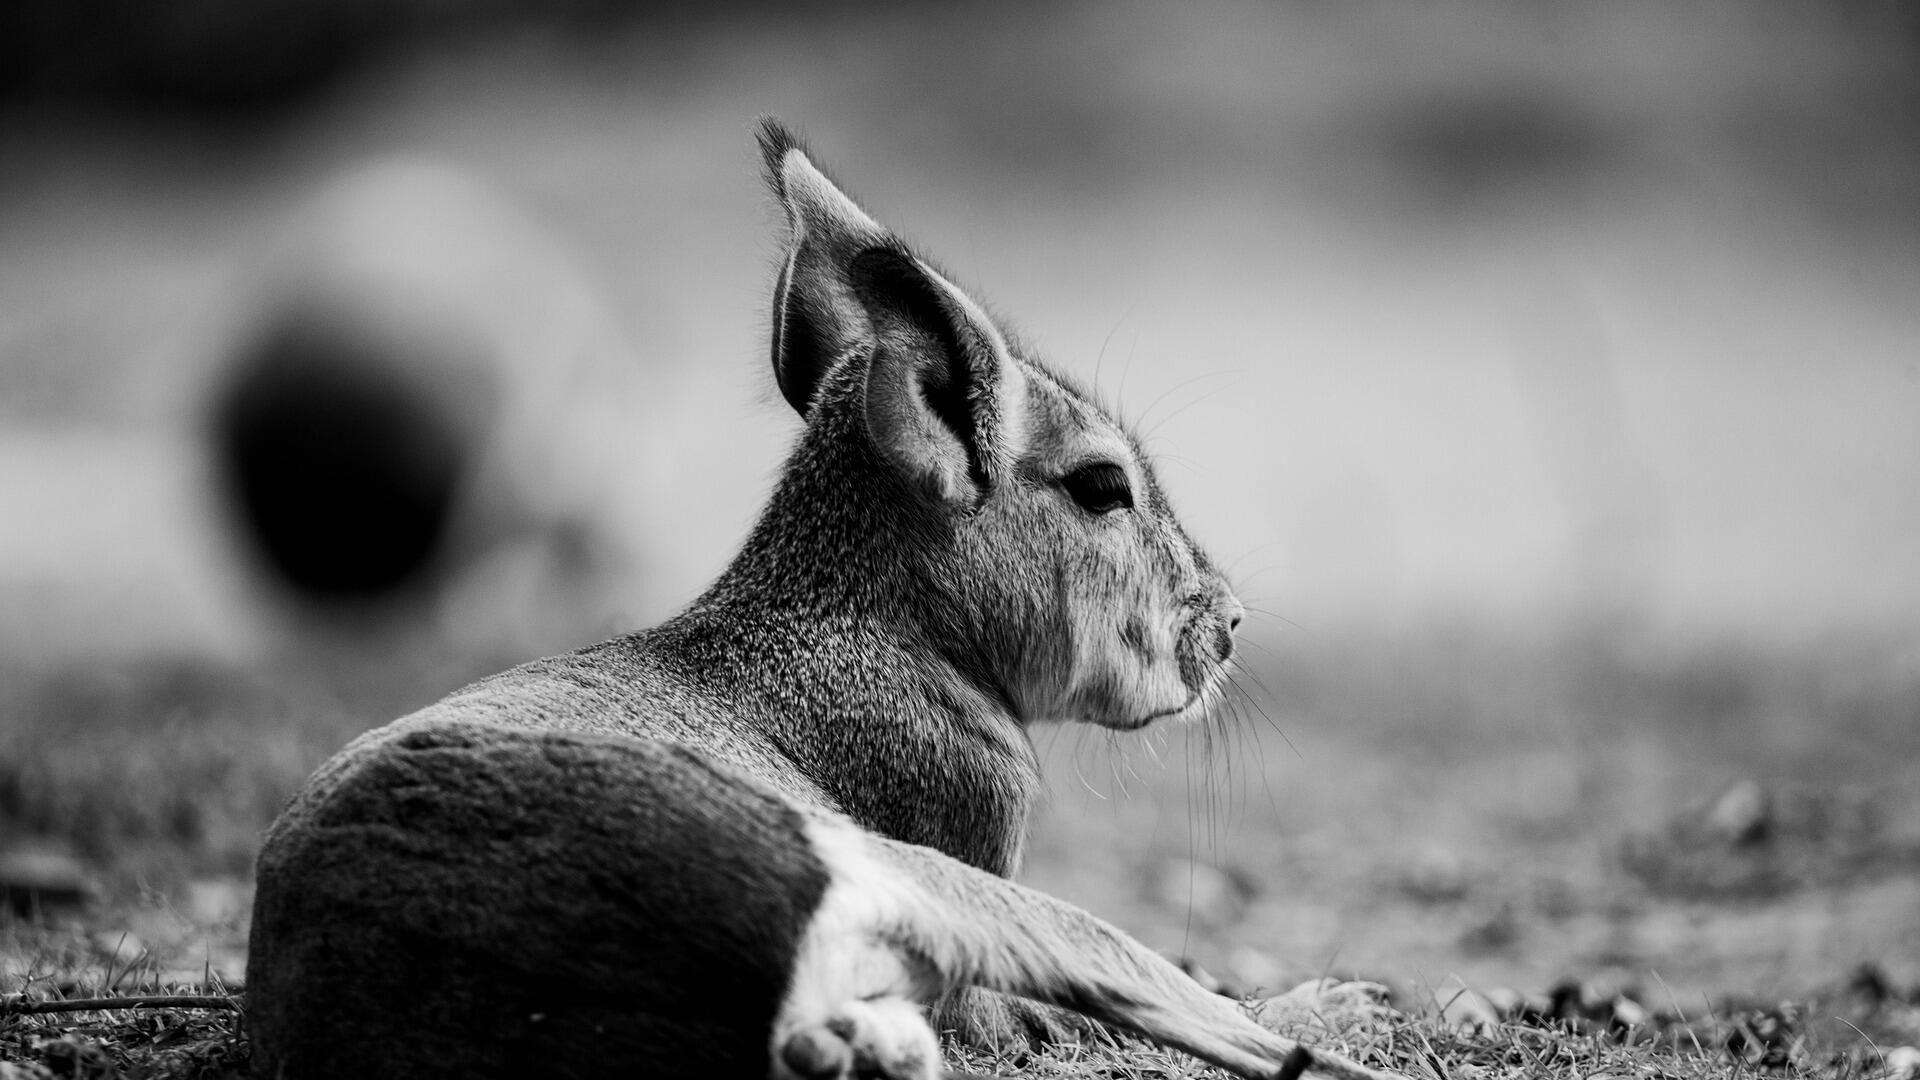 Baby-Känguru - SNA, 1920, 13.10.2021